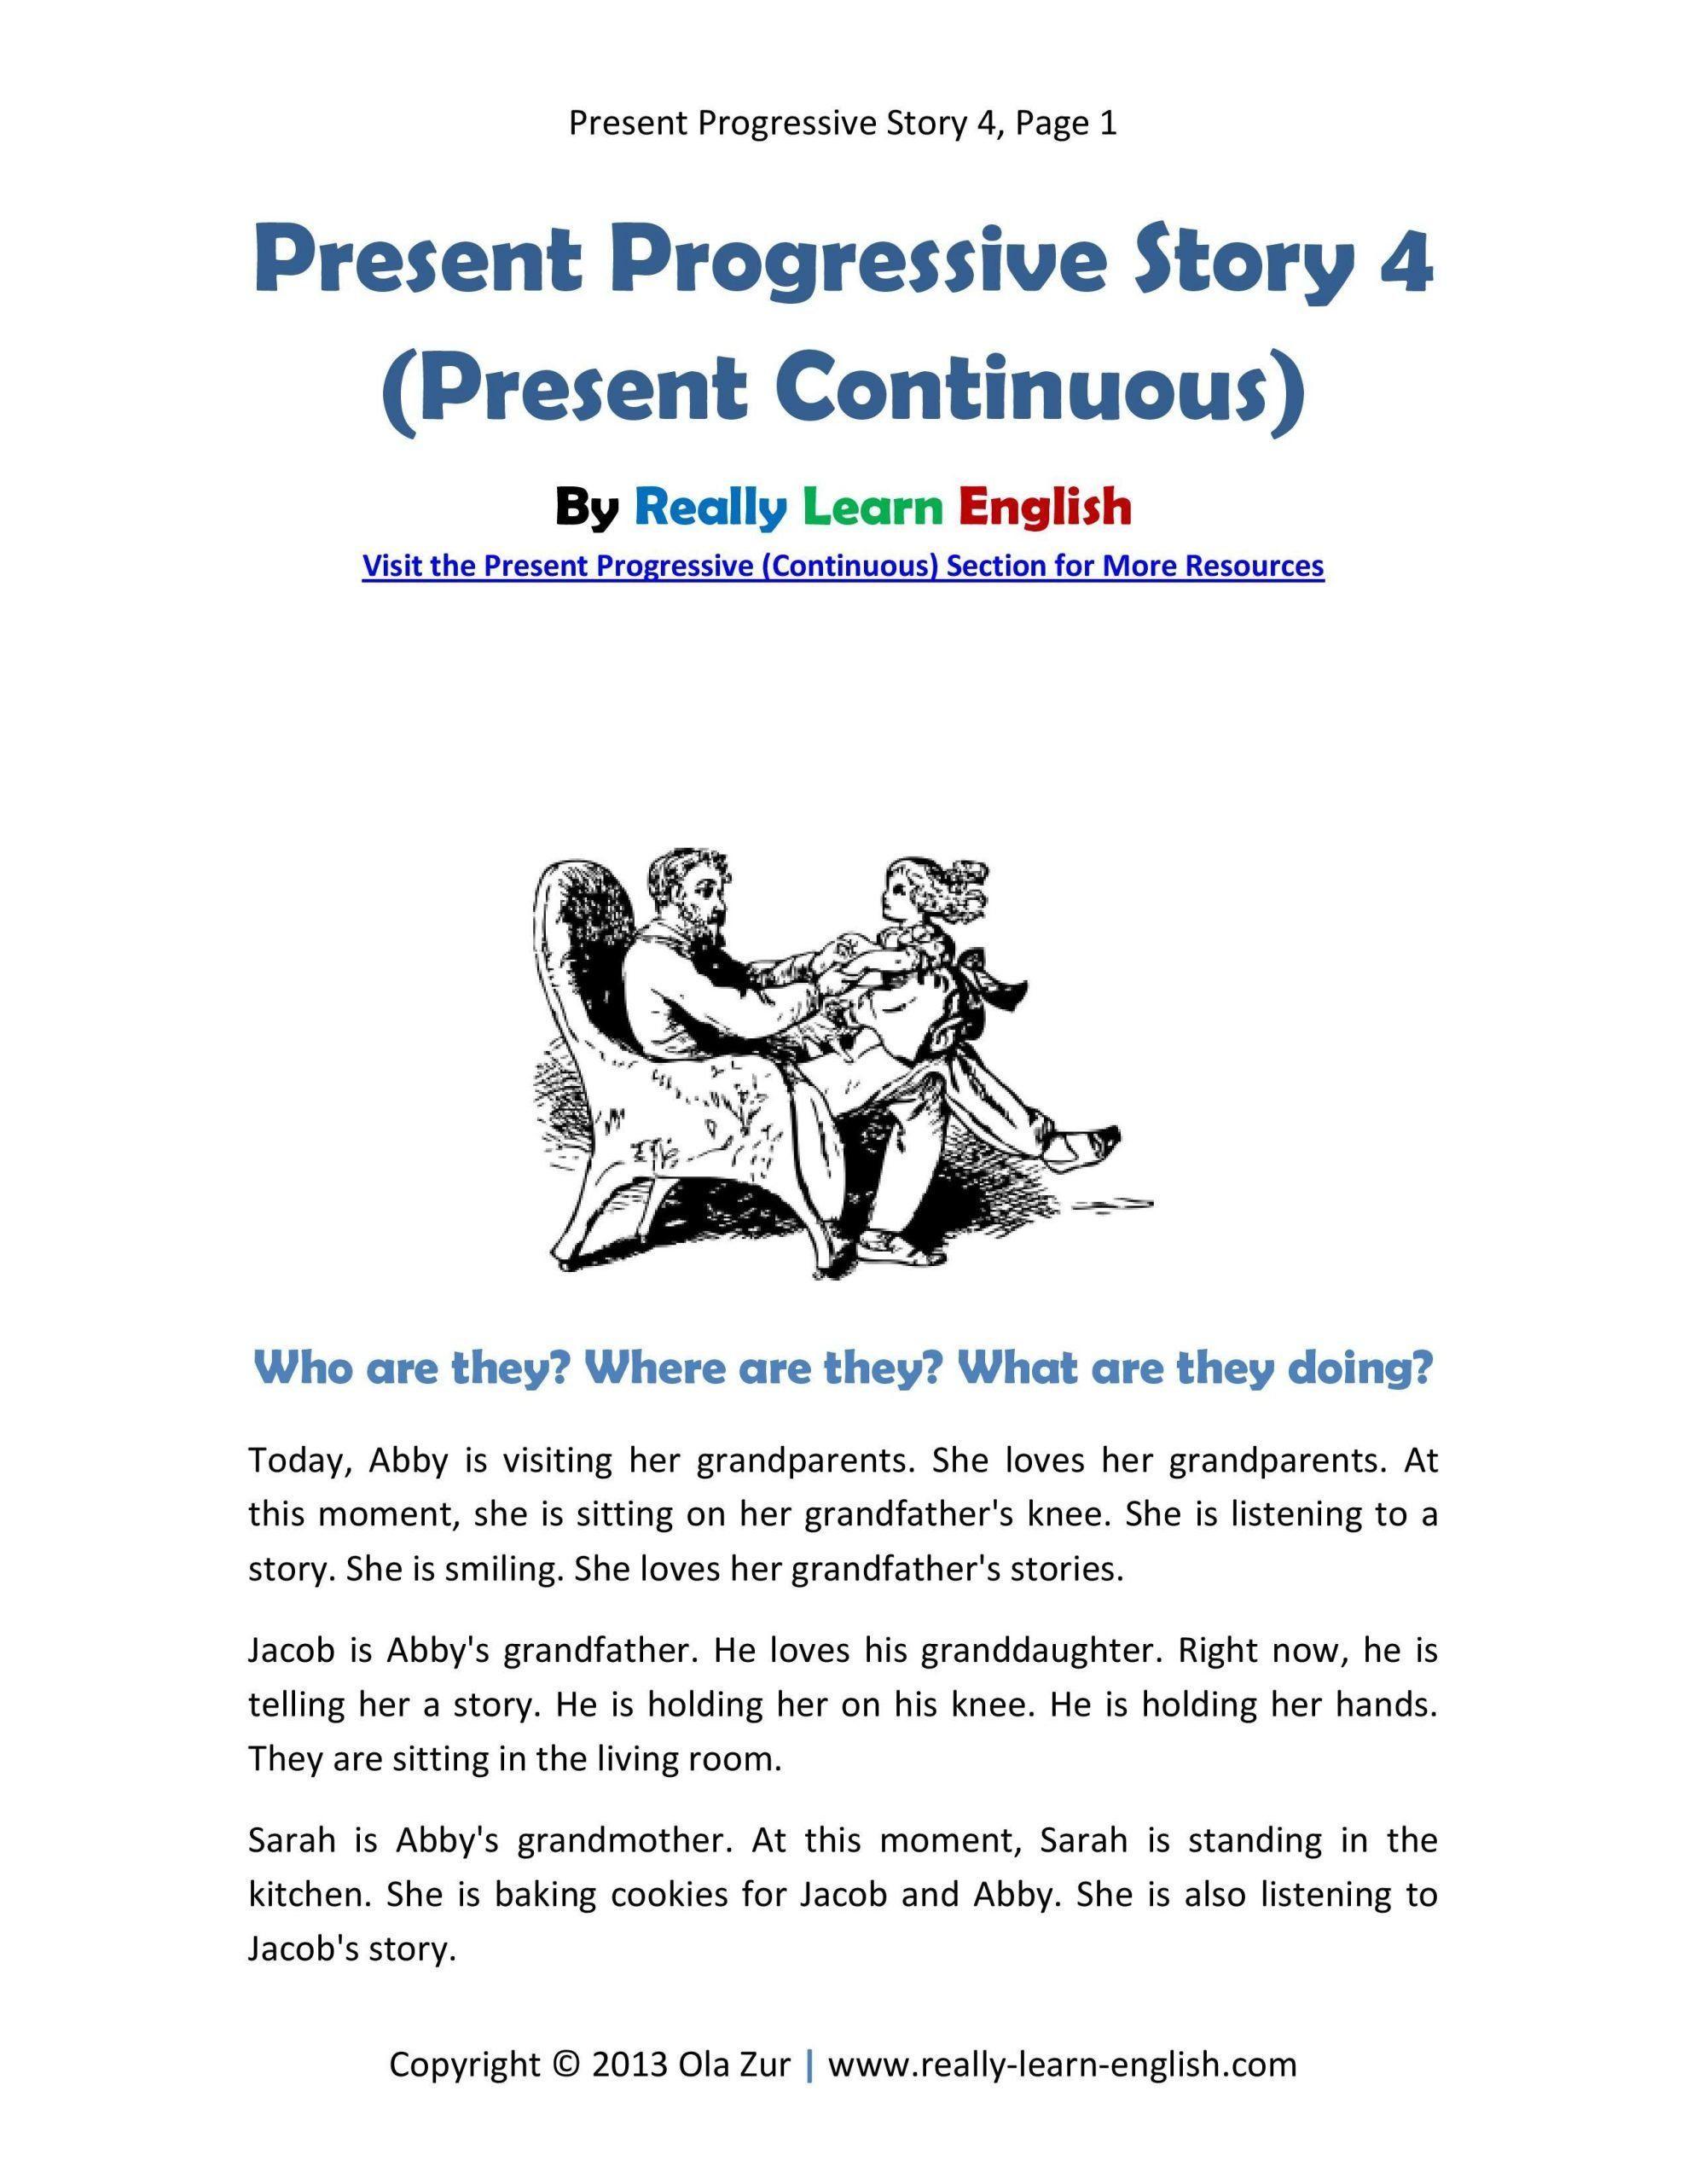 Present Progressive Spanish Worksheet Answers English Esl